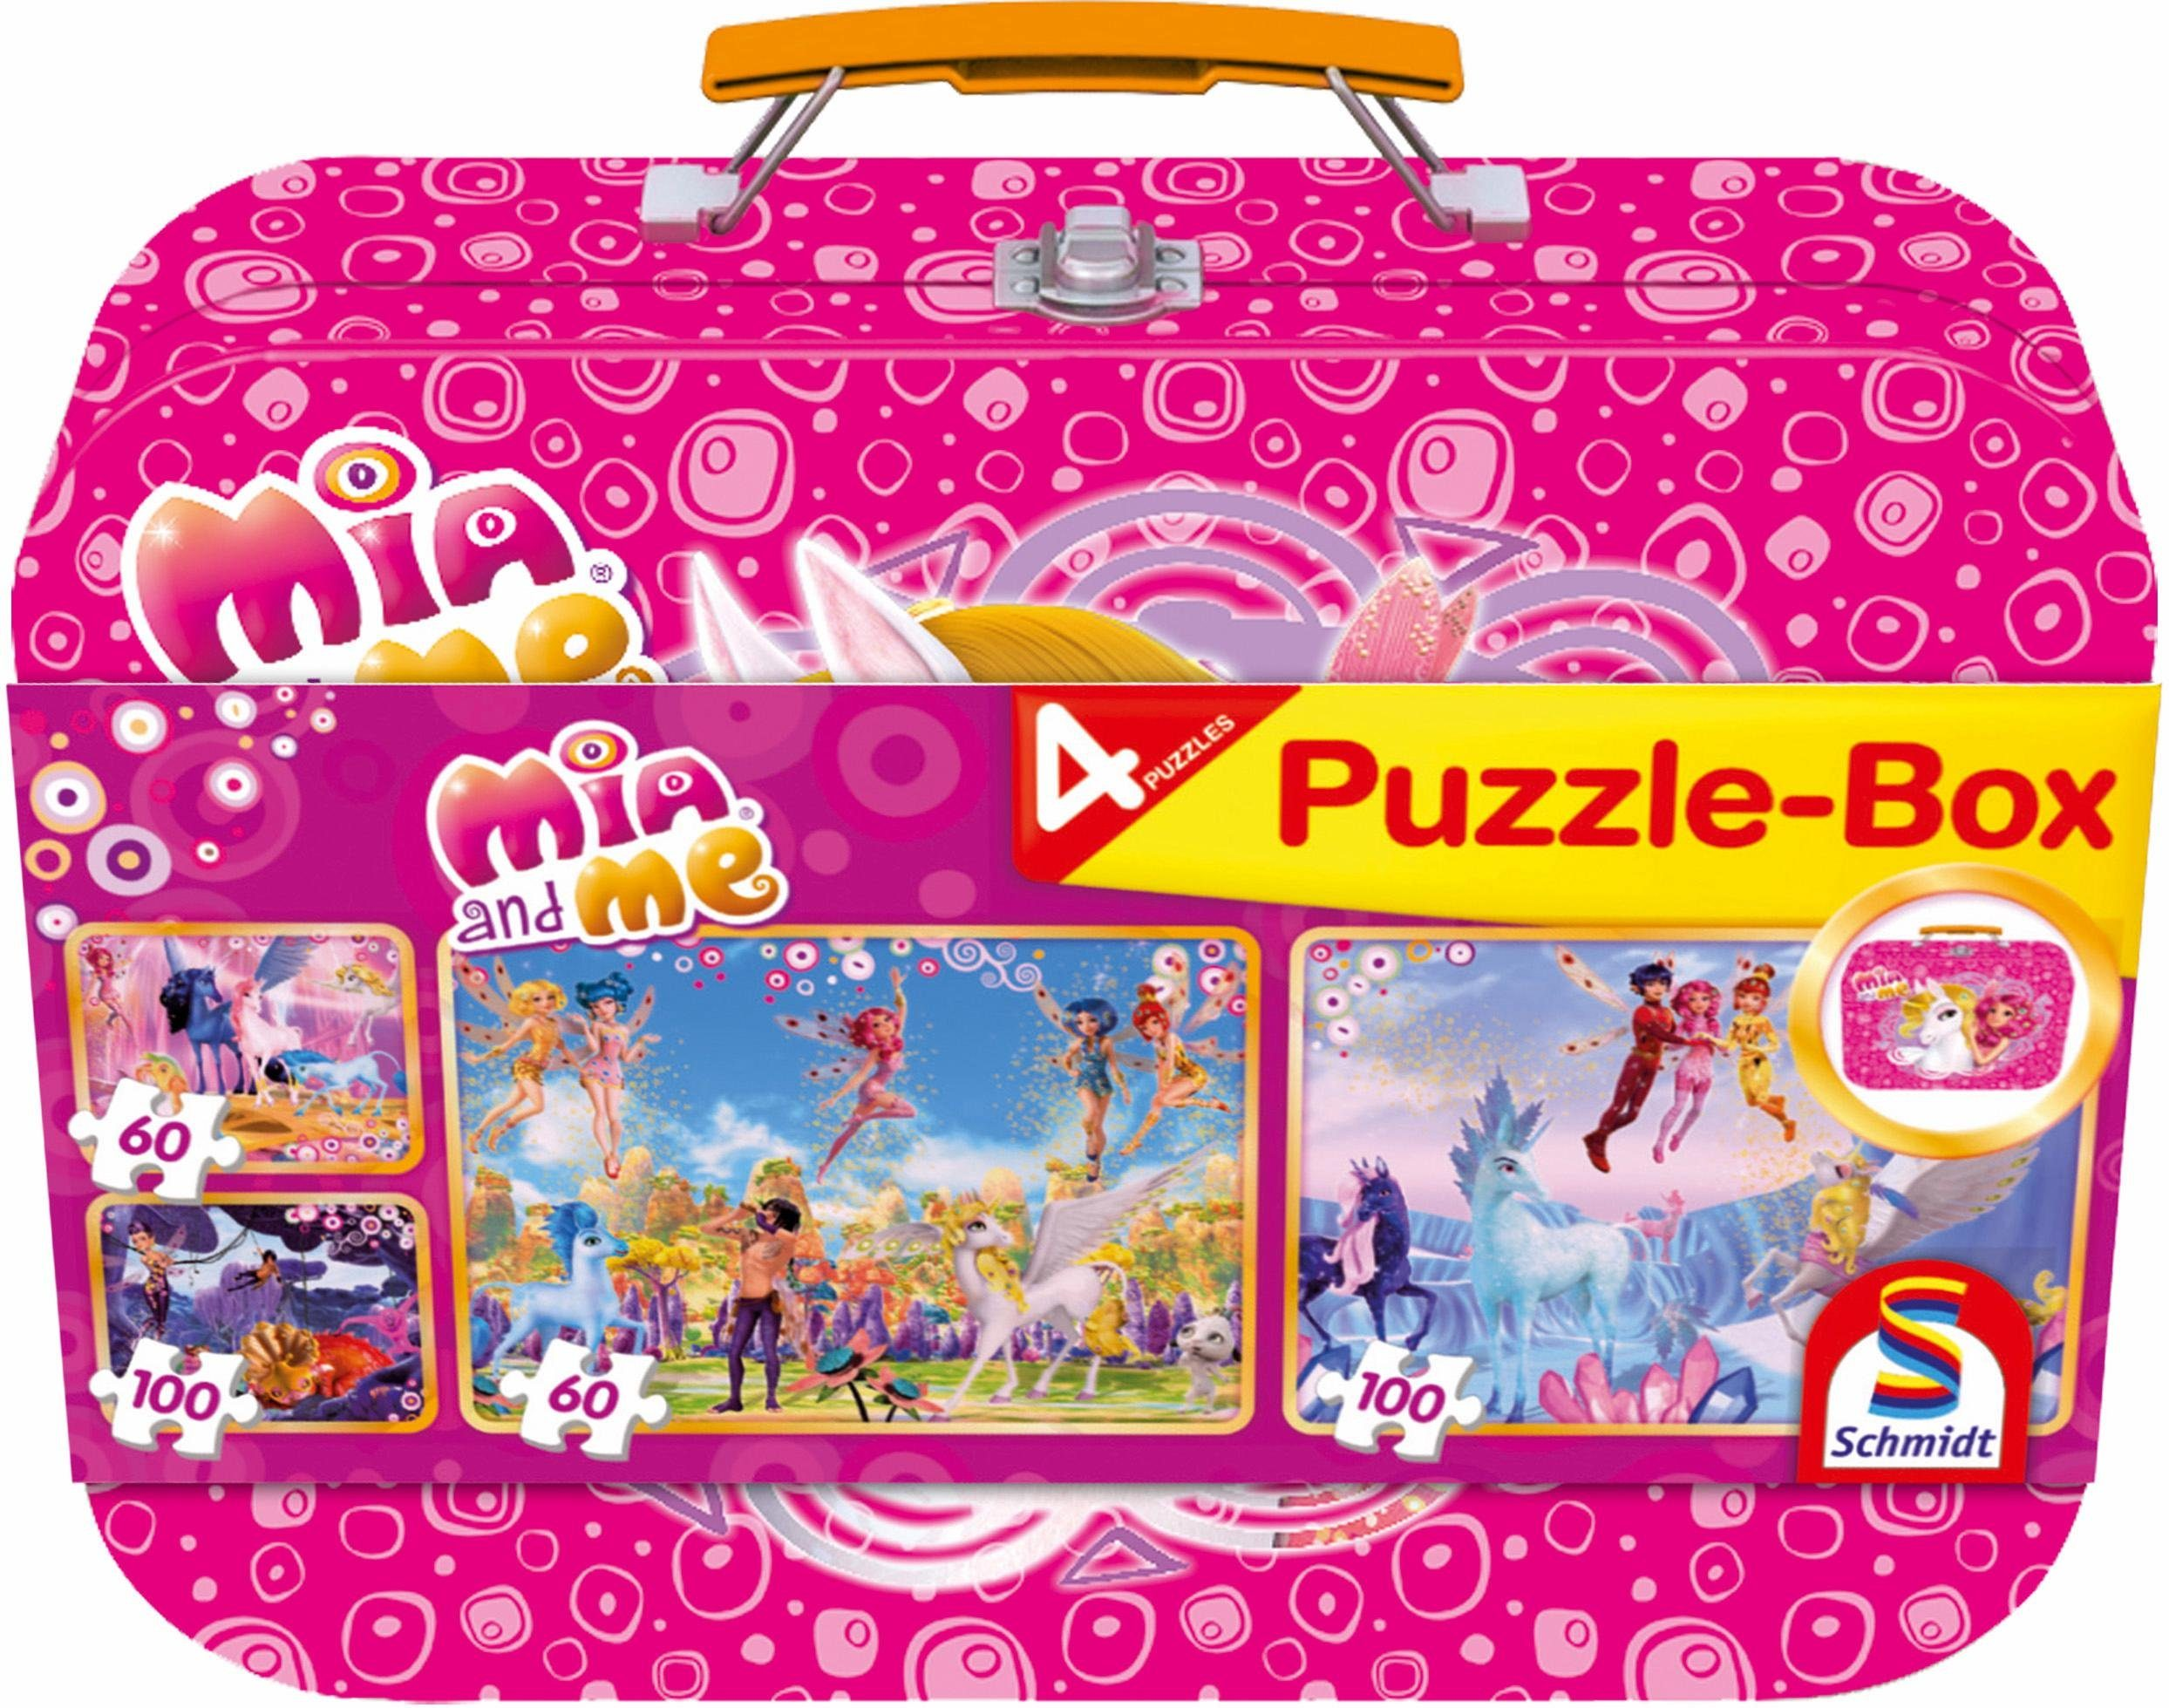 Schmidt Spiele Puzzle, »Mia and Me Box, 2x60 und 2x100 Teile«